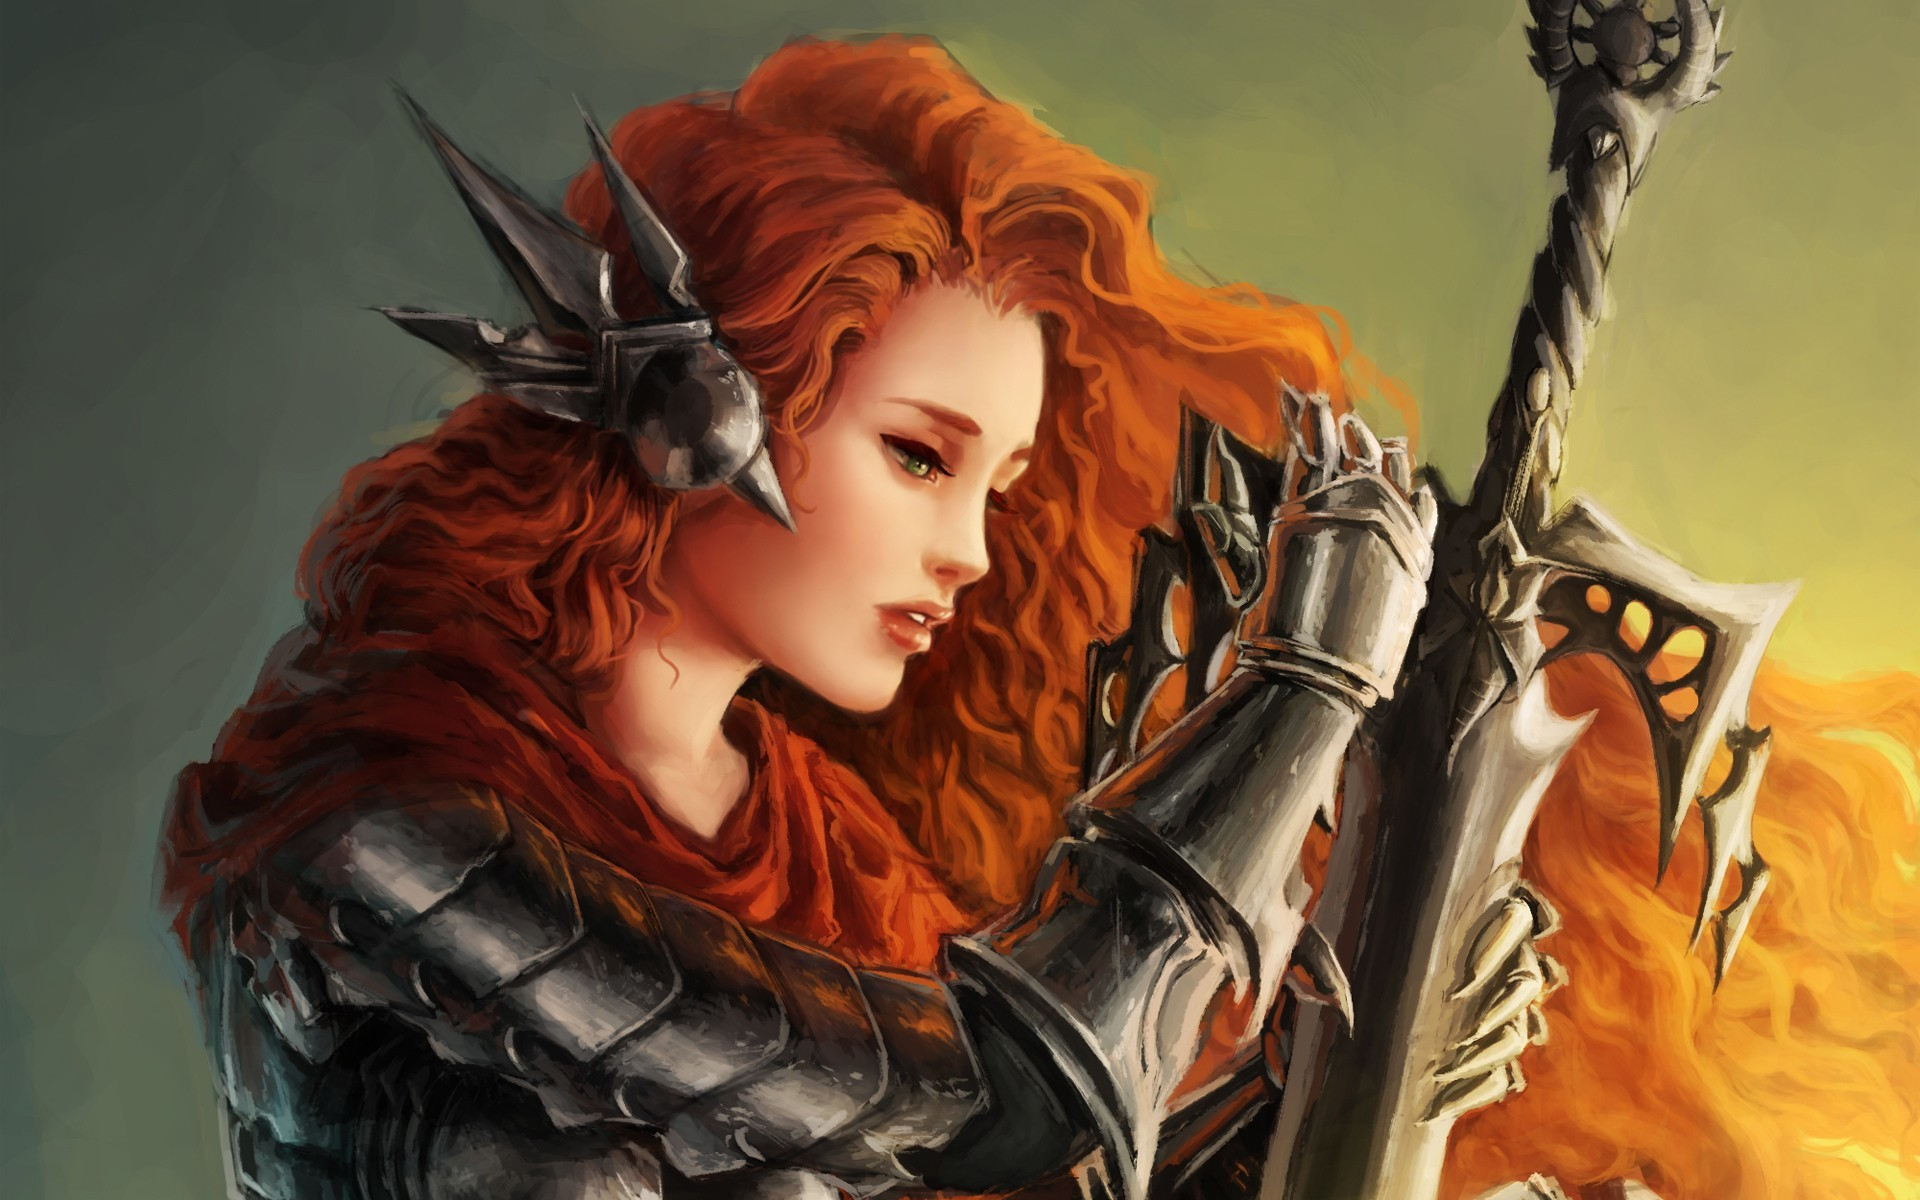 Women fantasy art armor artwork warriors orange hair swords wallpaper |  | 55628 | WallpaperUP